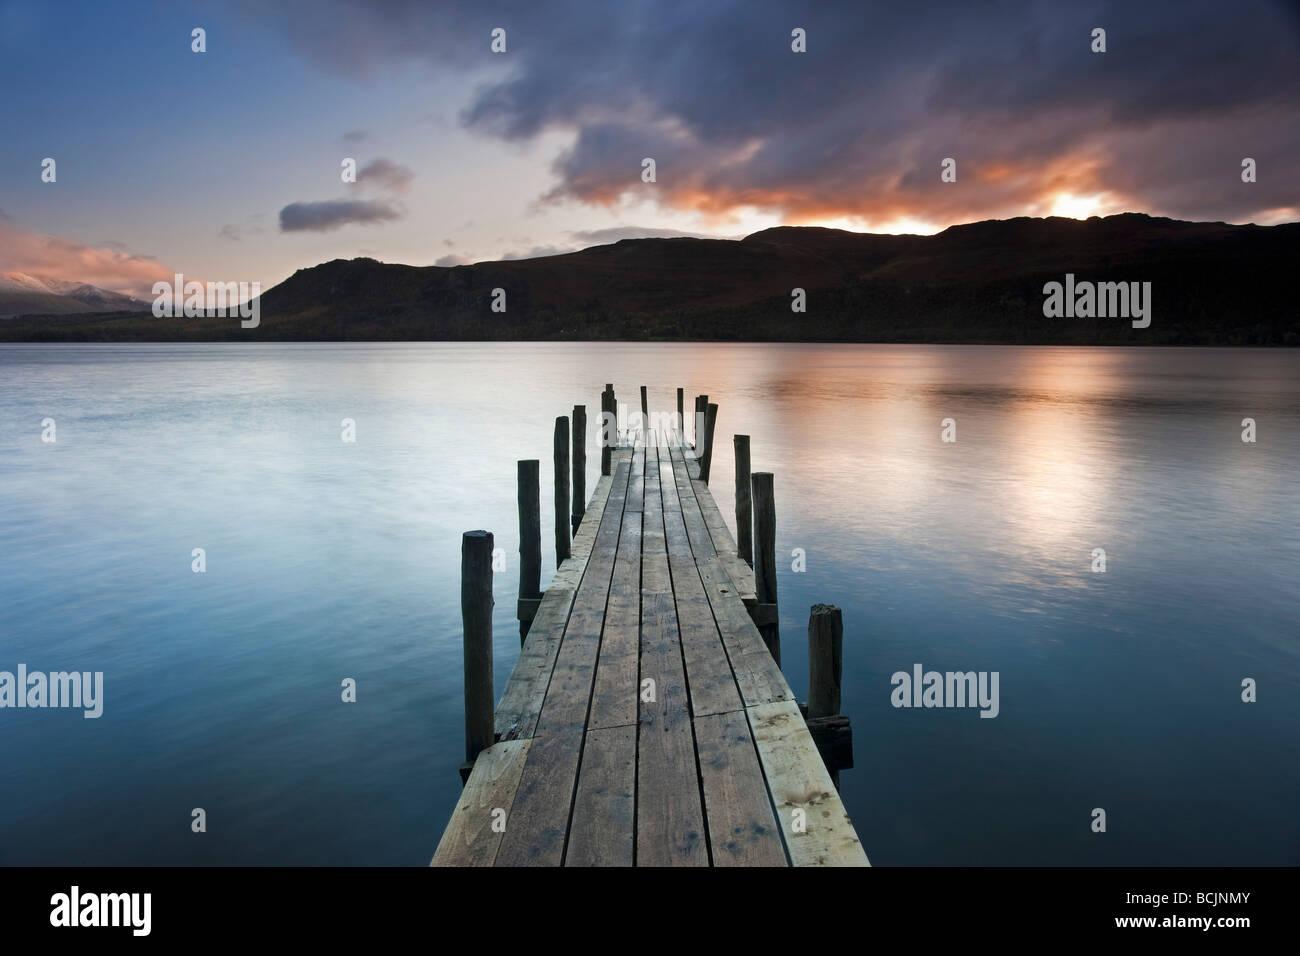 Brandelhow Bay jetty at dawn, Derwentwater, Keswick, Lake District National Park, Cumbria, England, UK - Stock Image